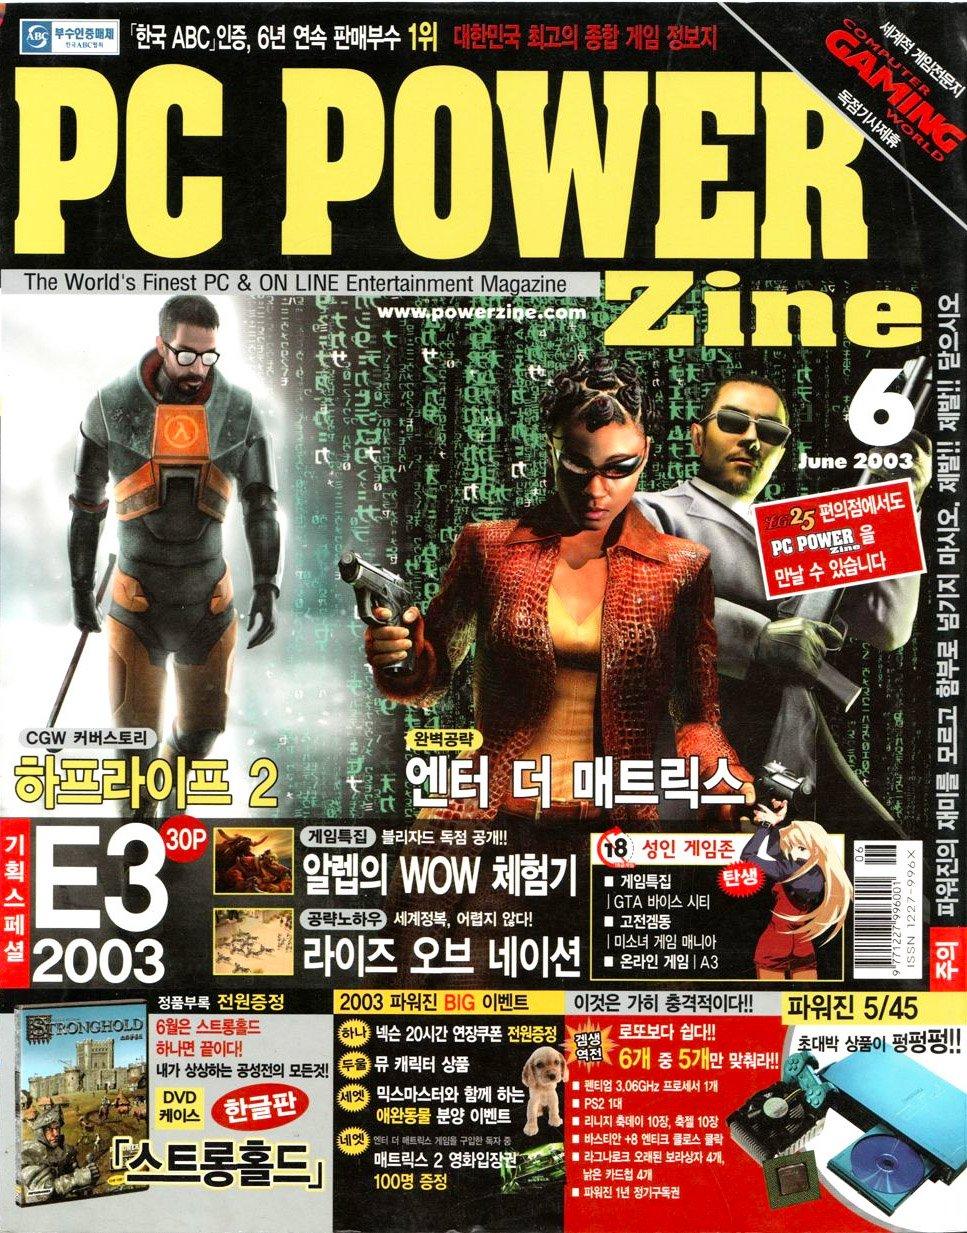 PC Power Zine Issue 095 (June 2003)